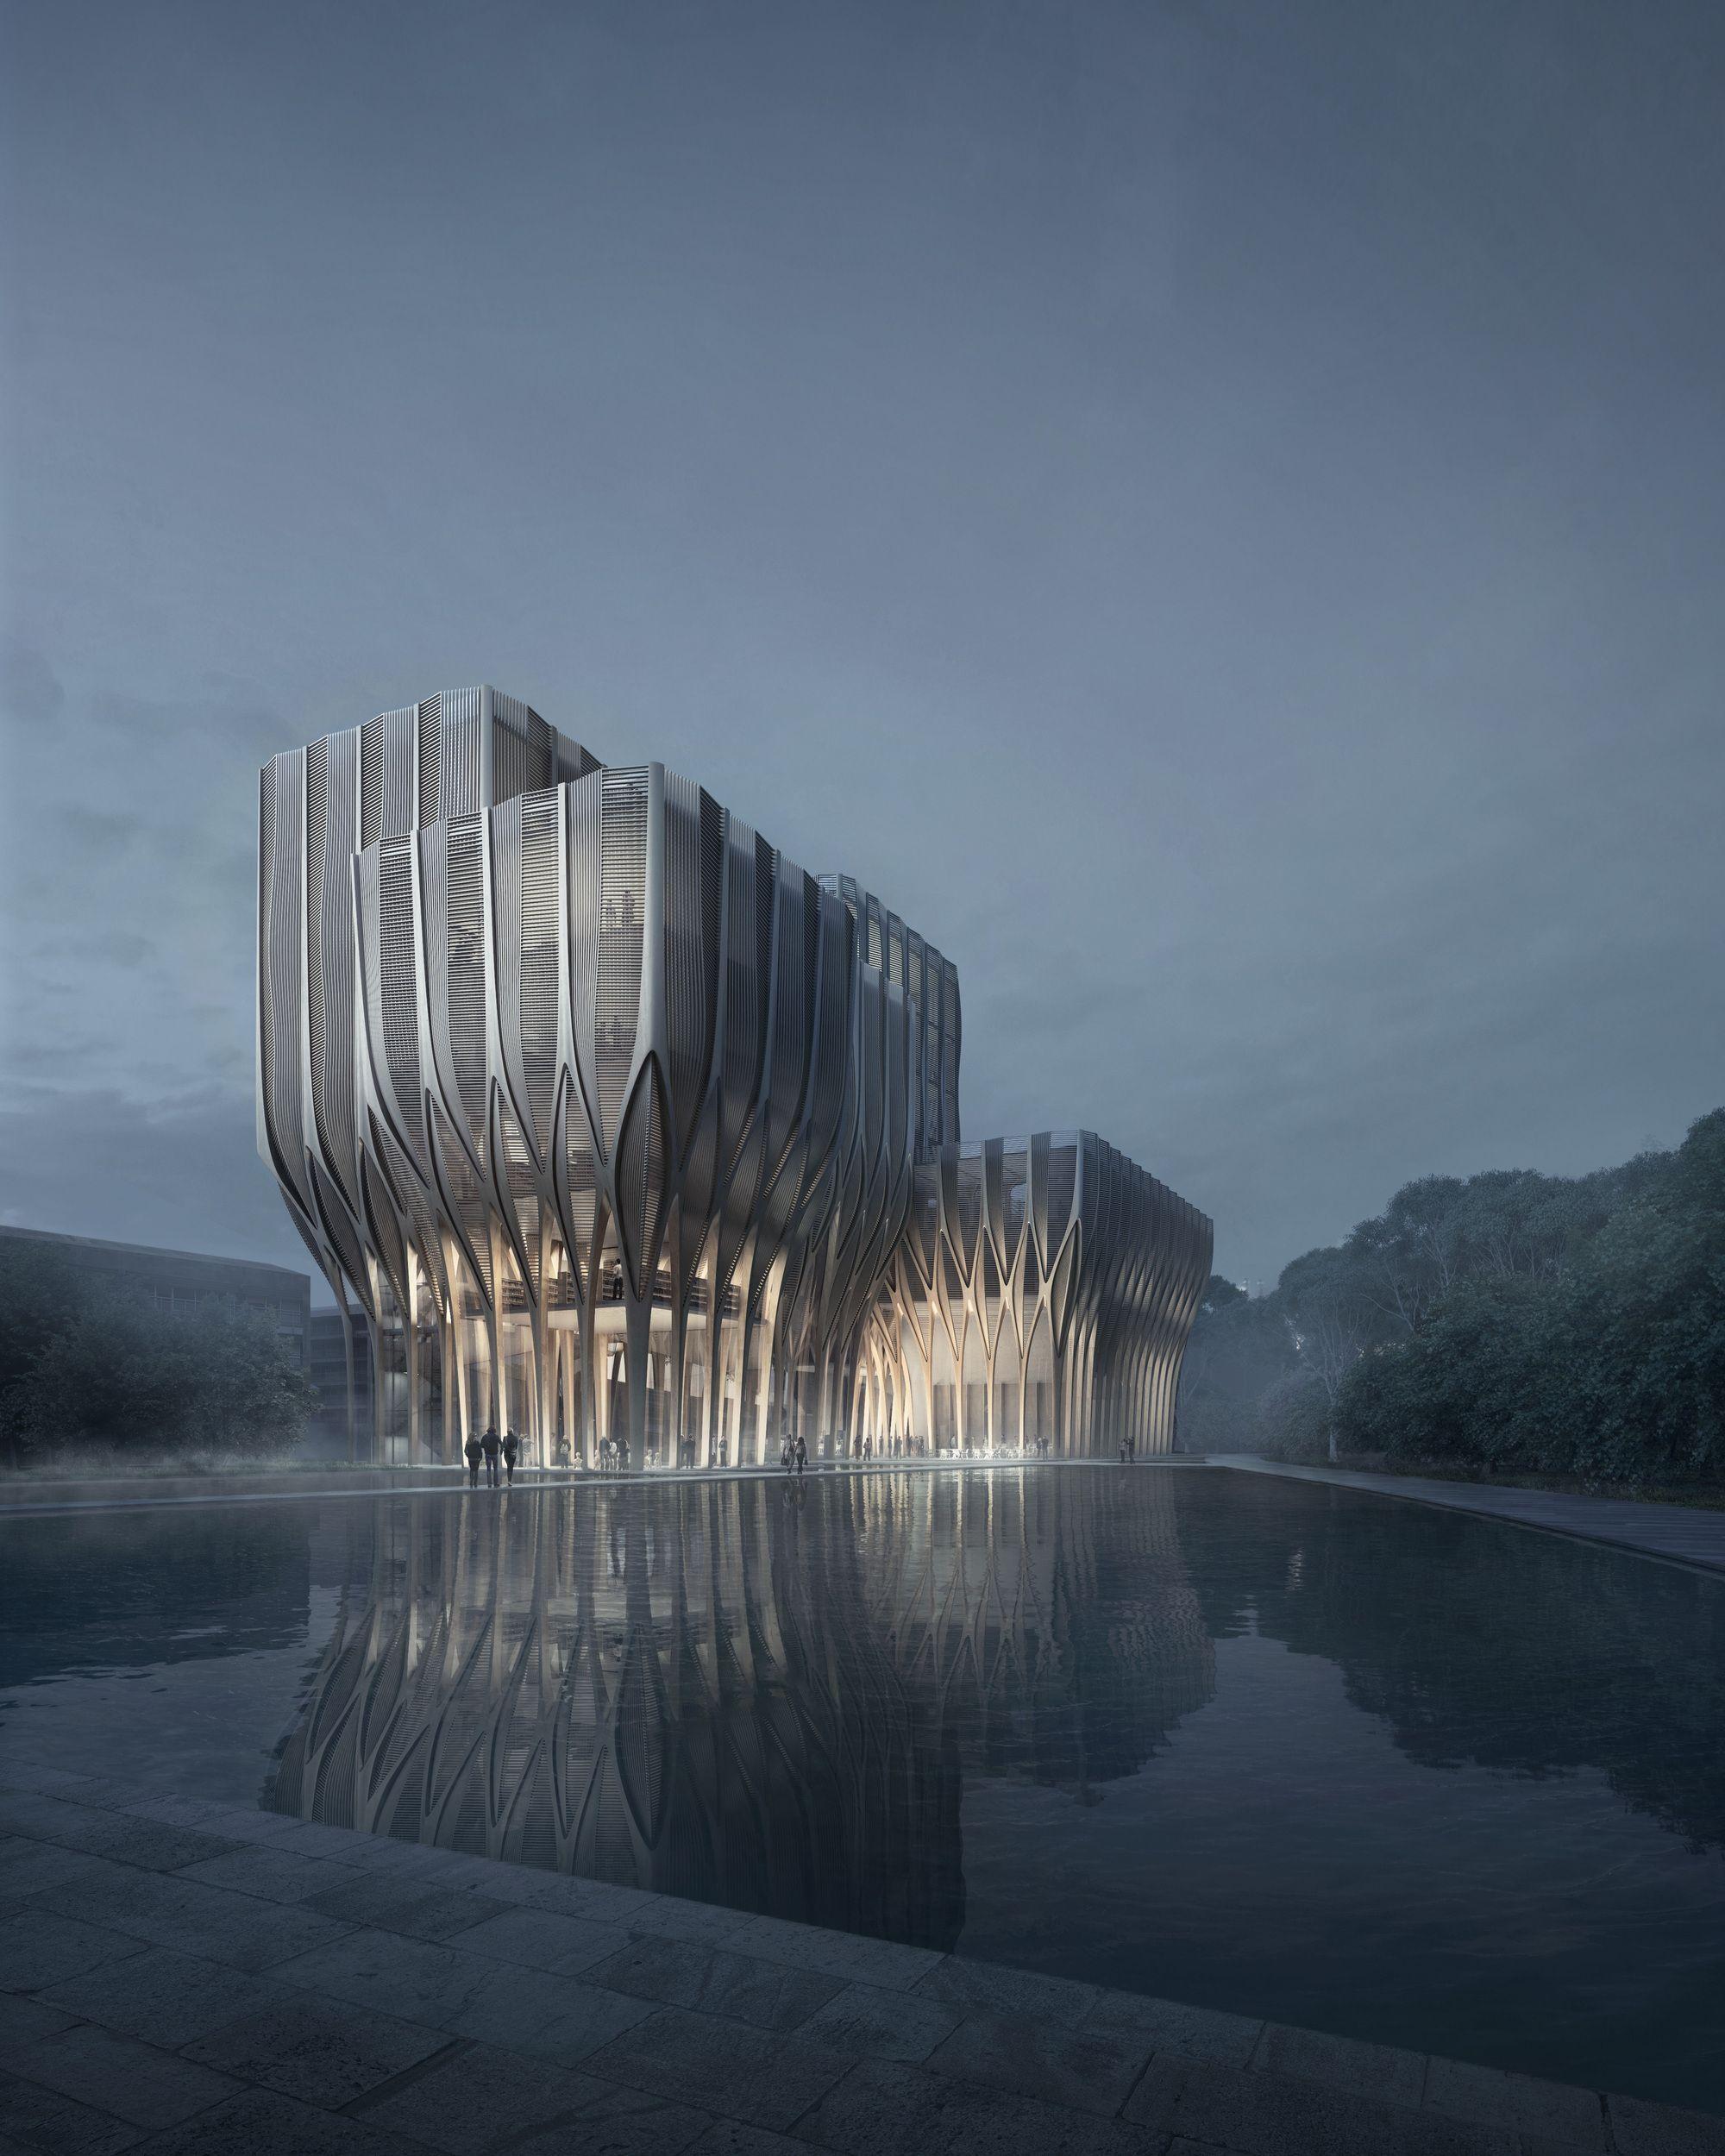 Sleuk Rith Institute Zaha Hadid Architects